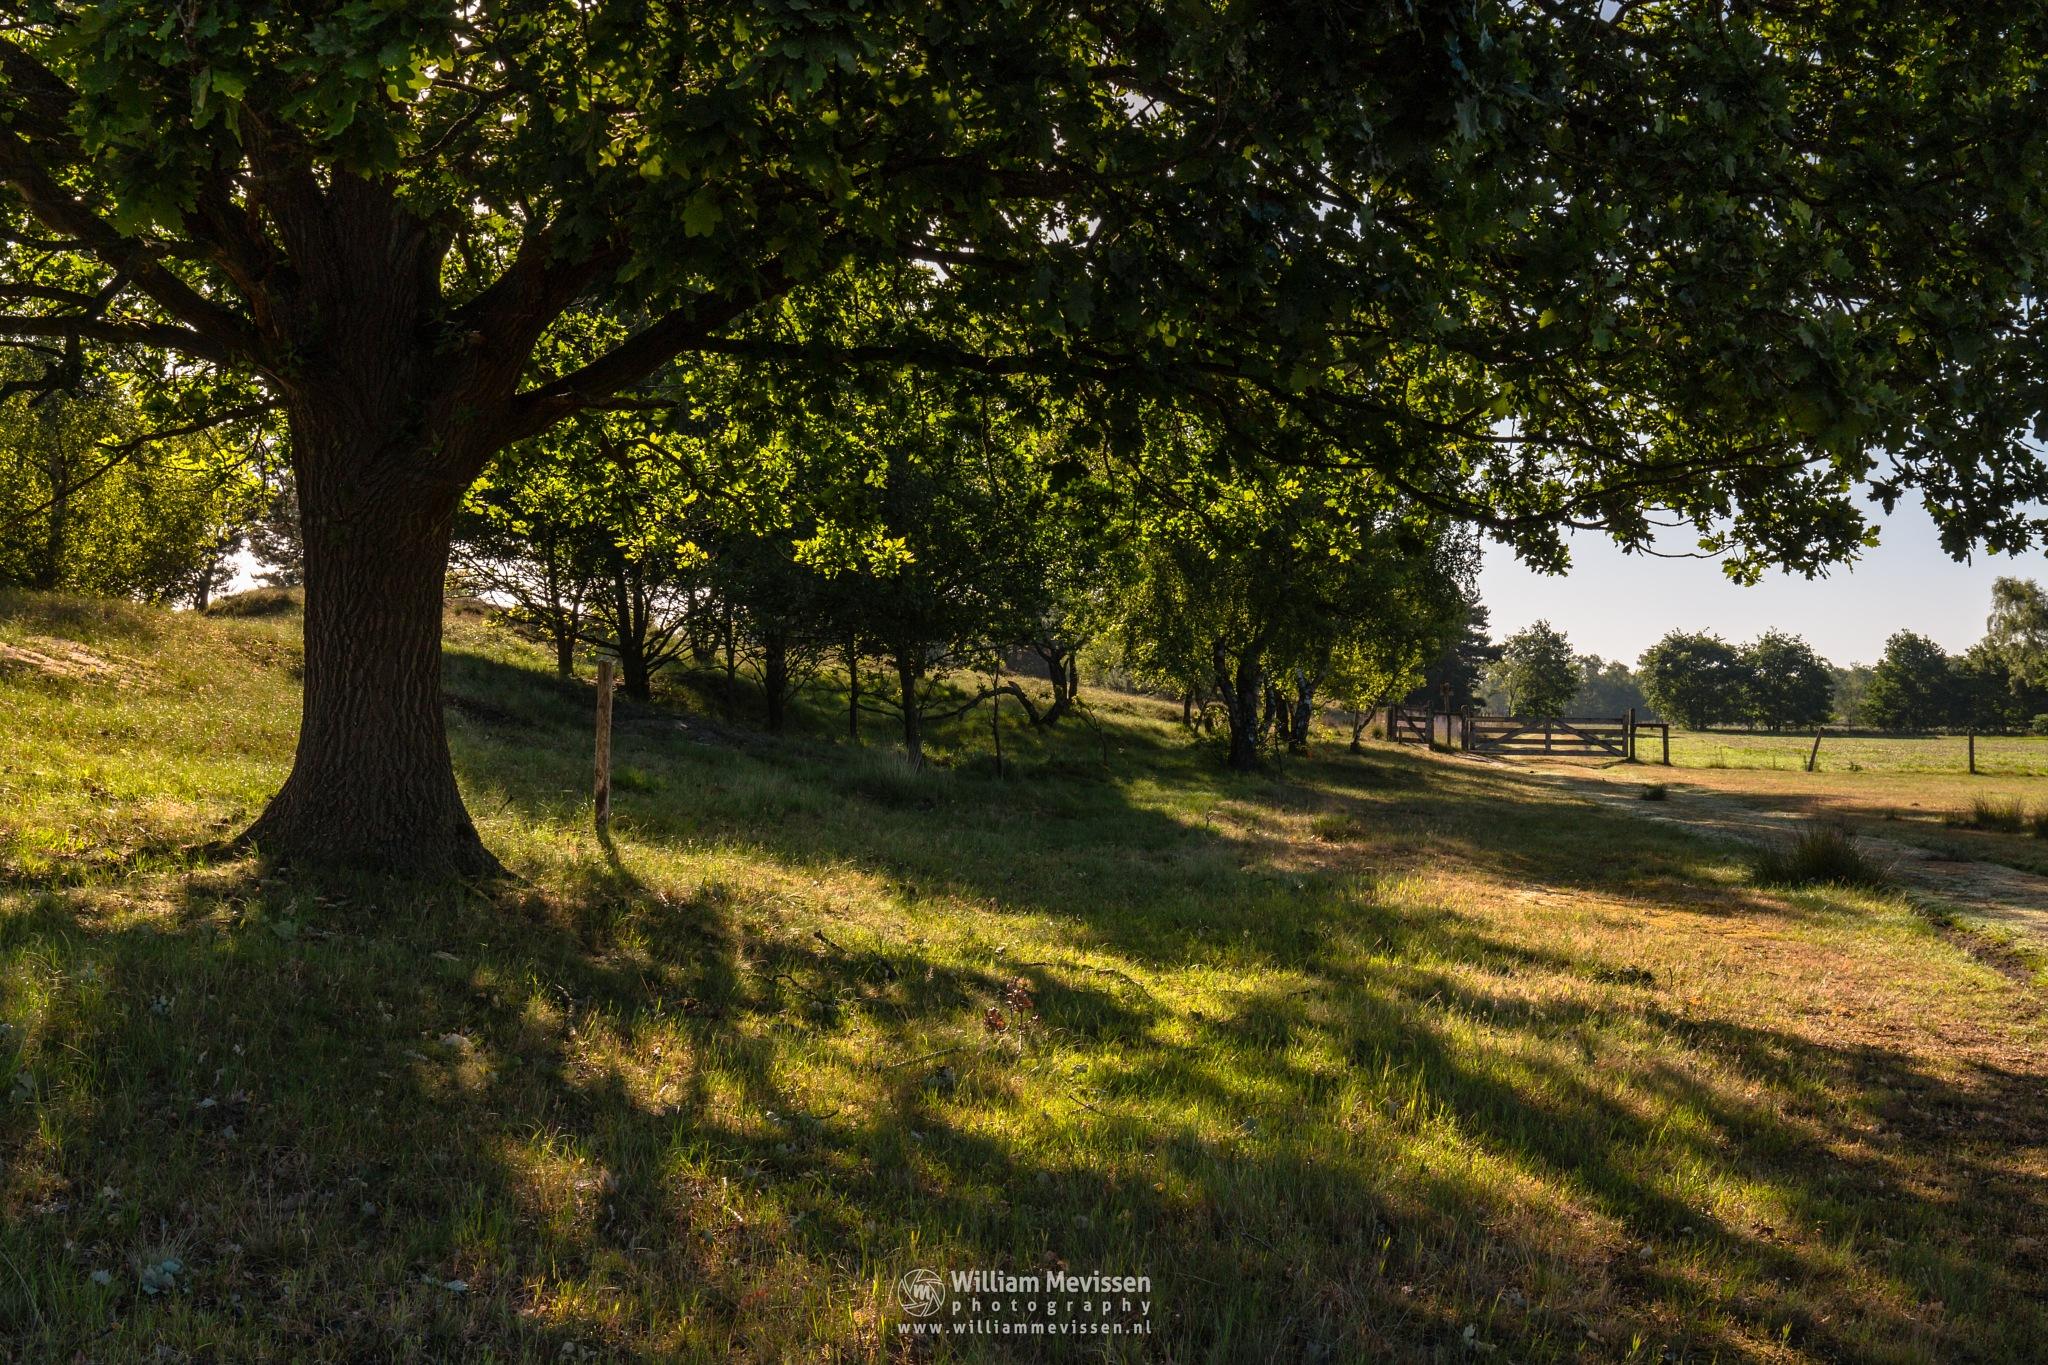 Tree Shadows by William Mevissen